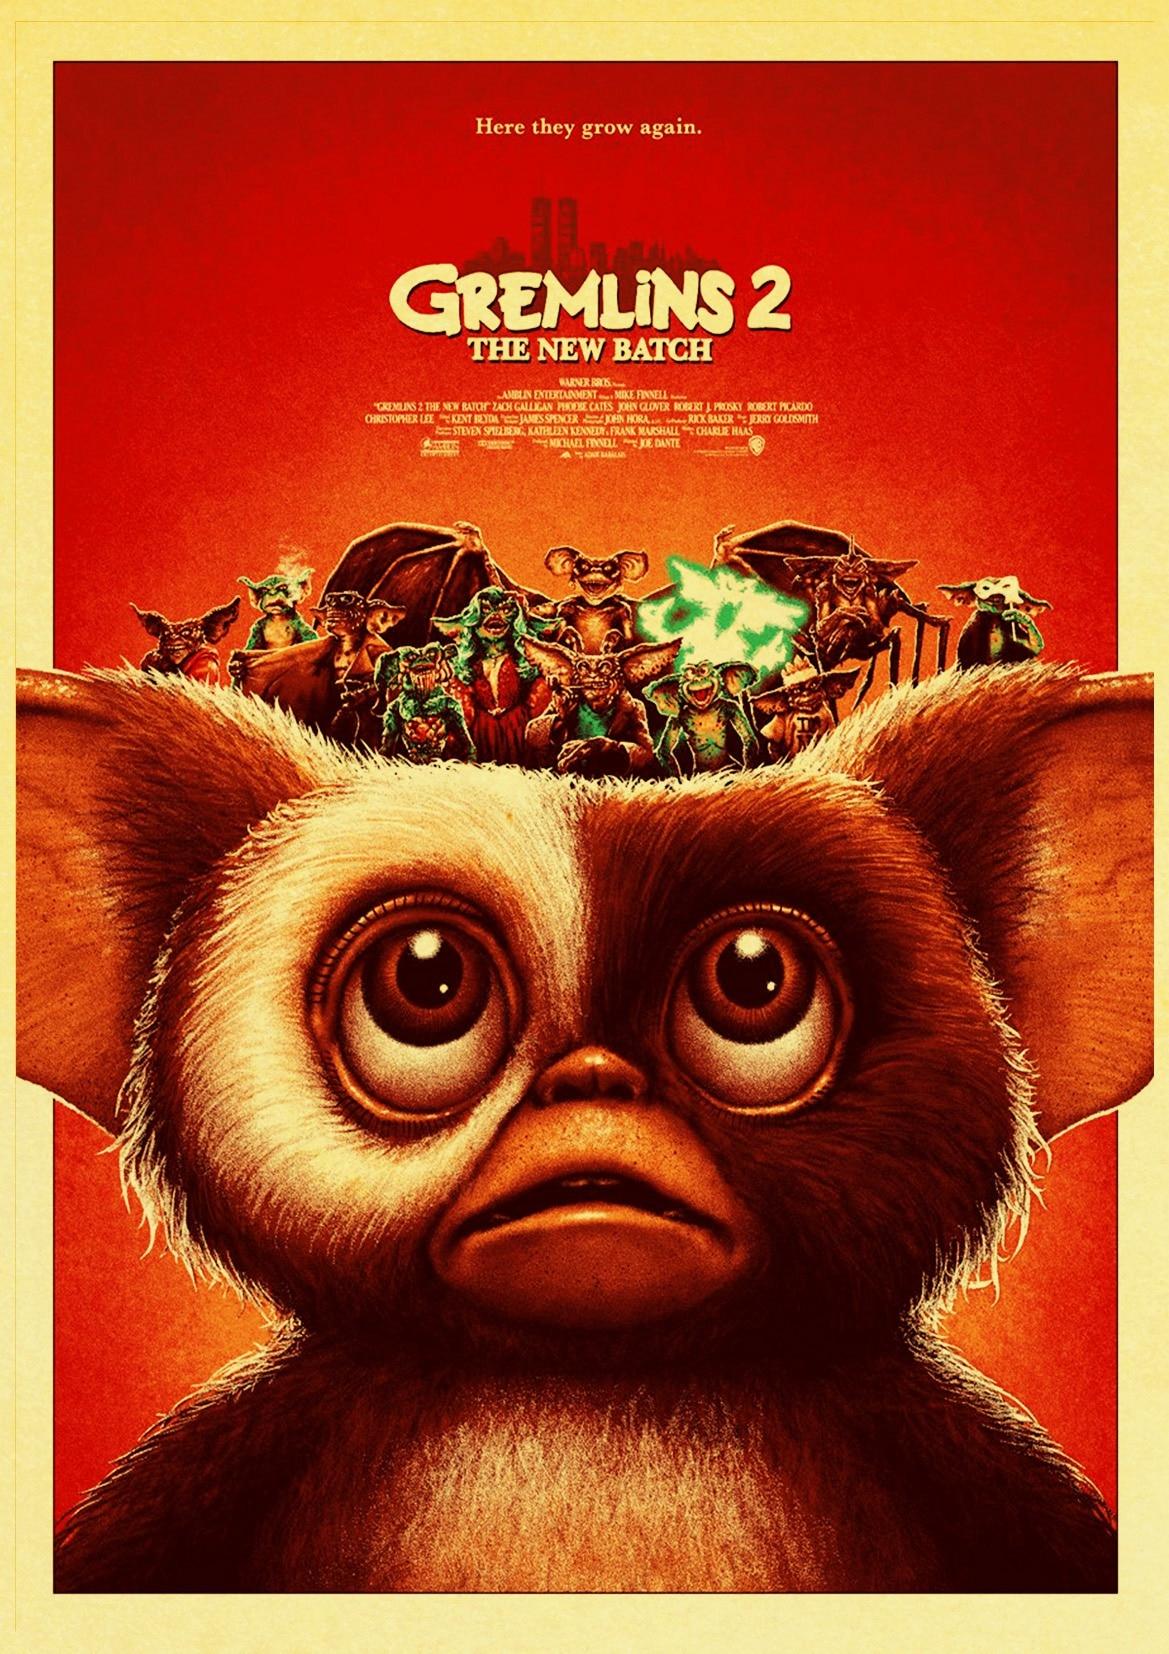 fantasy horror gremlins poster retro style decorative